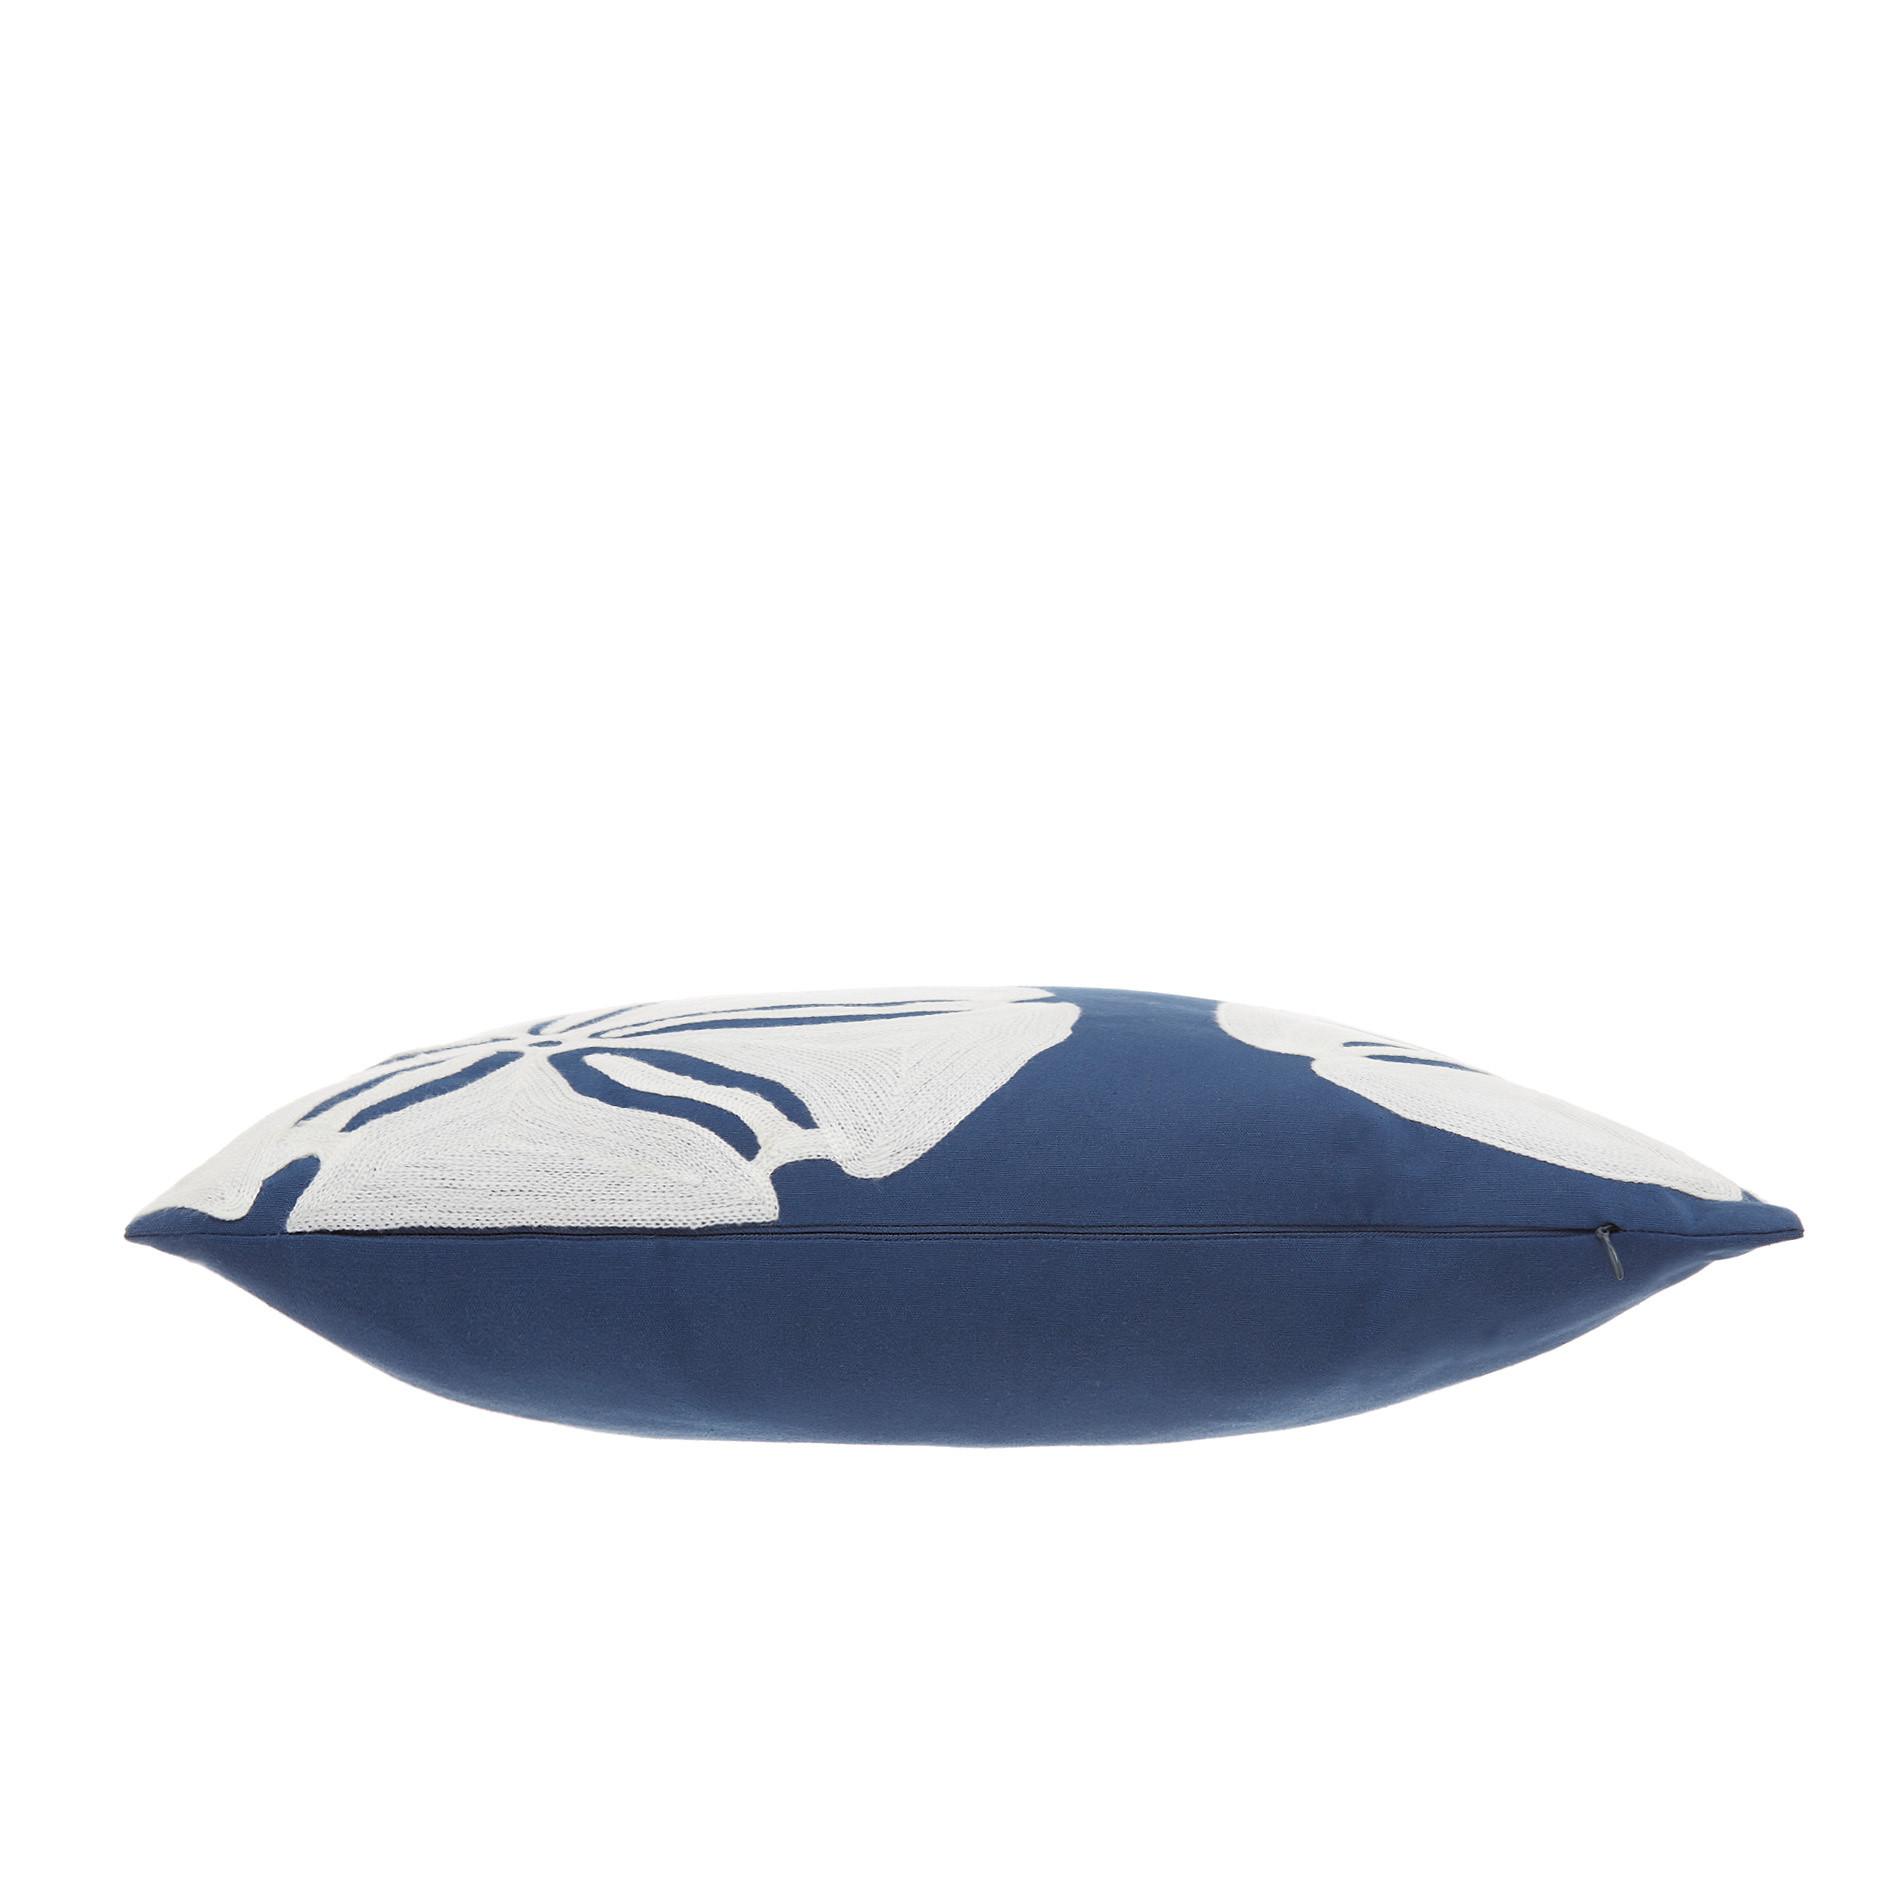 Cuscino ricamo conchiglie 45x45cm, Blu, large image number 3